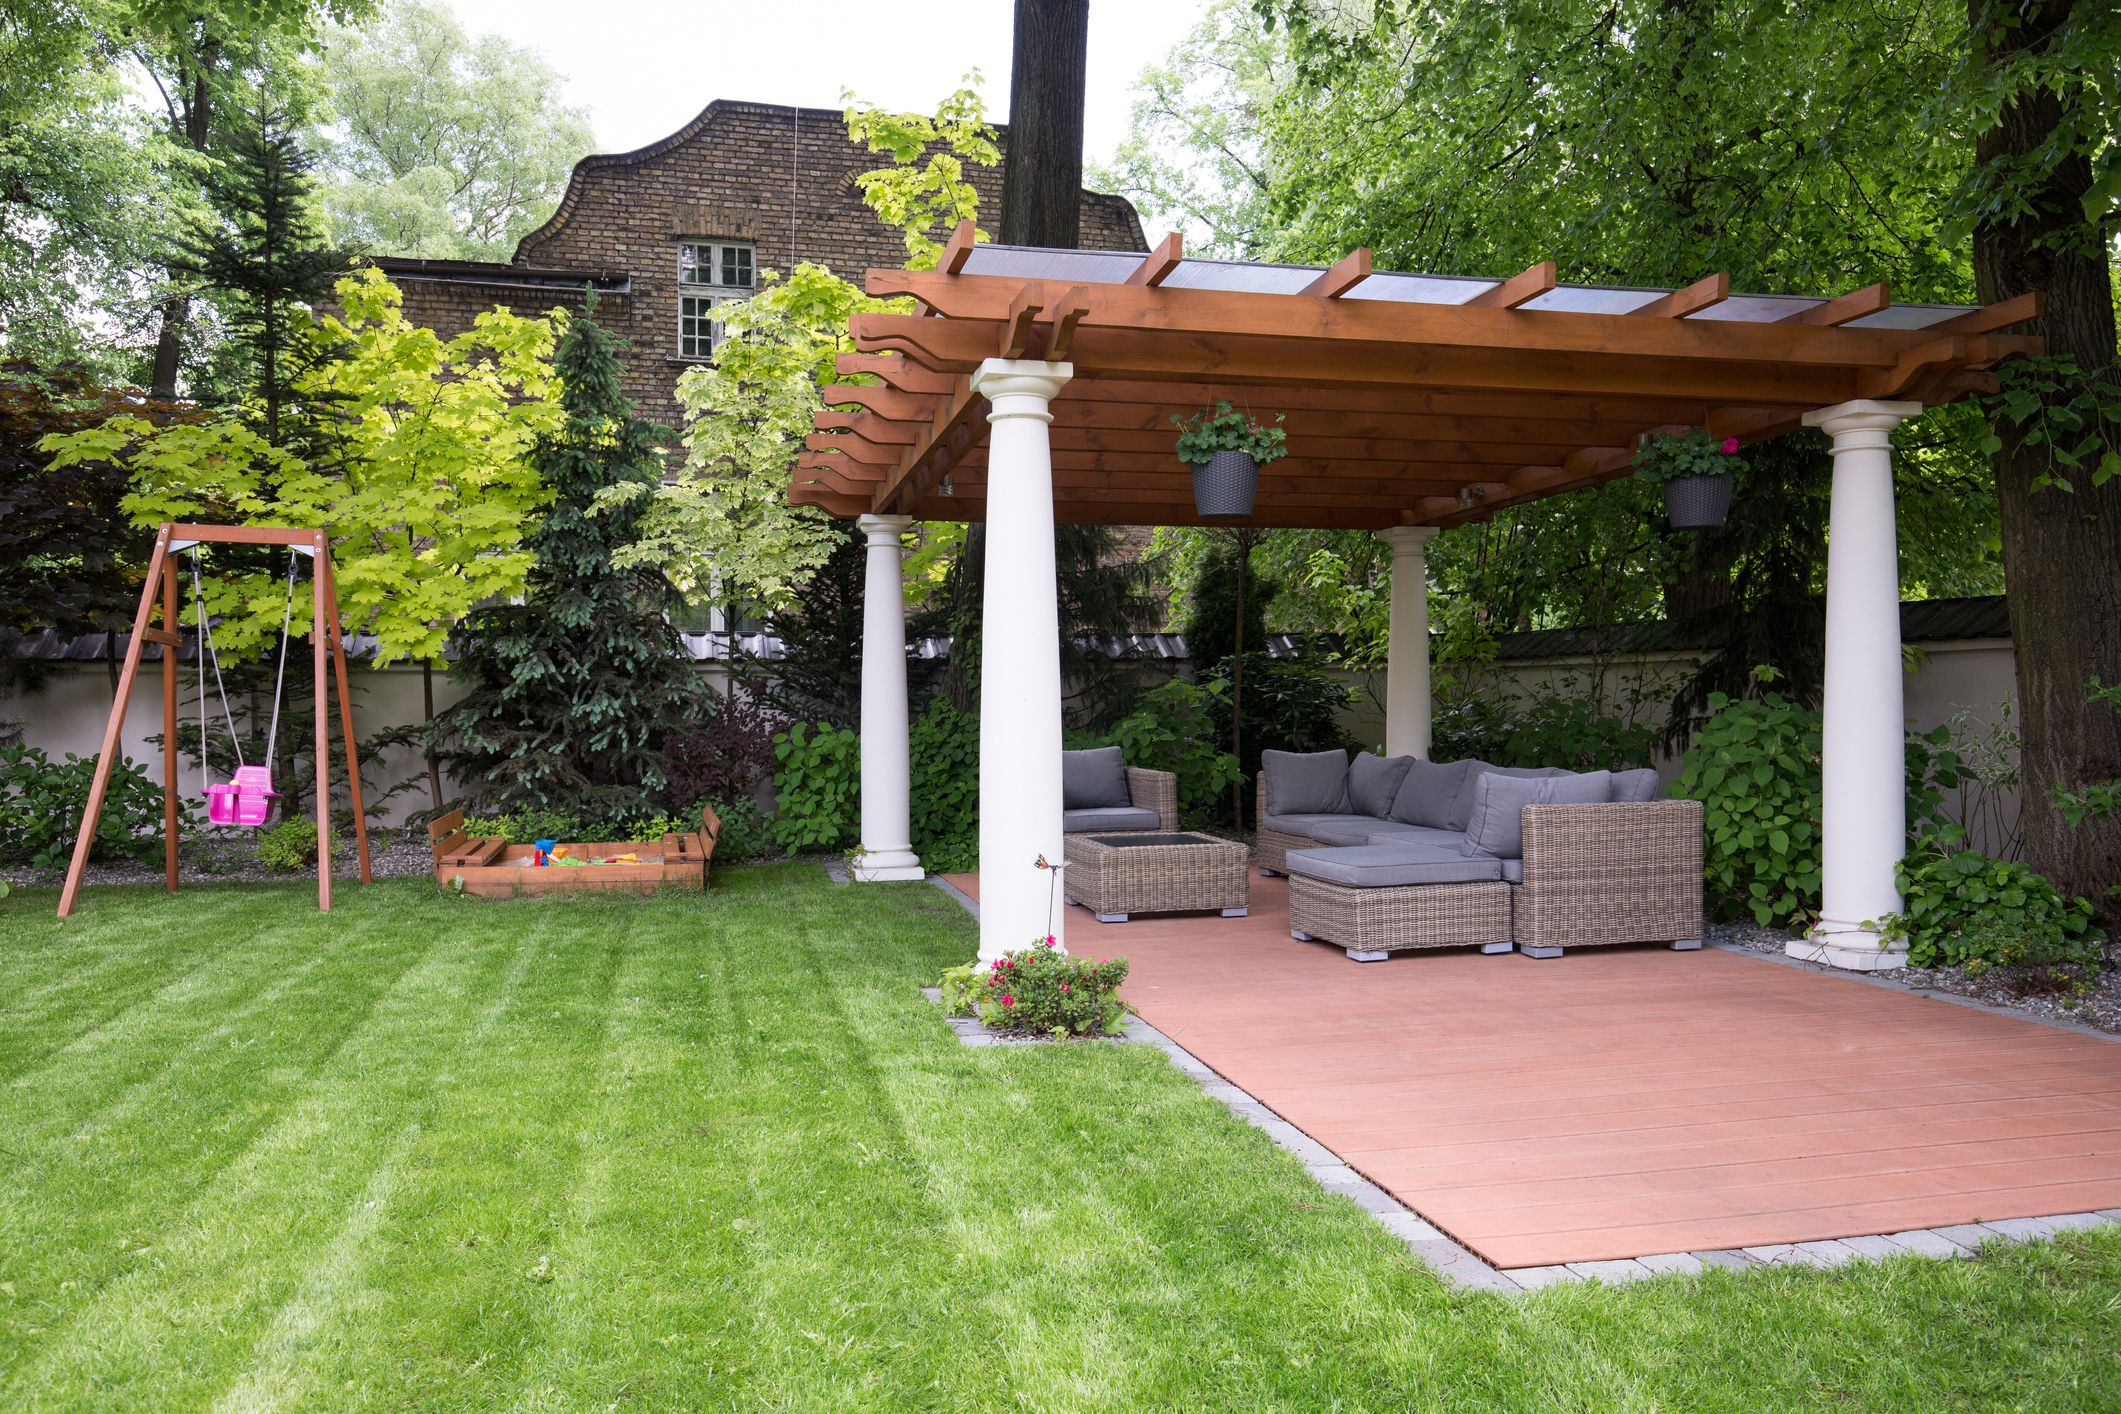 Beauty garden with modern gazebo